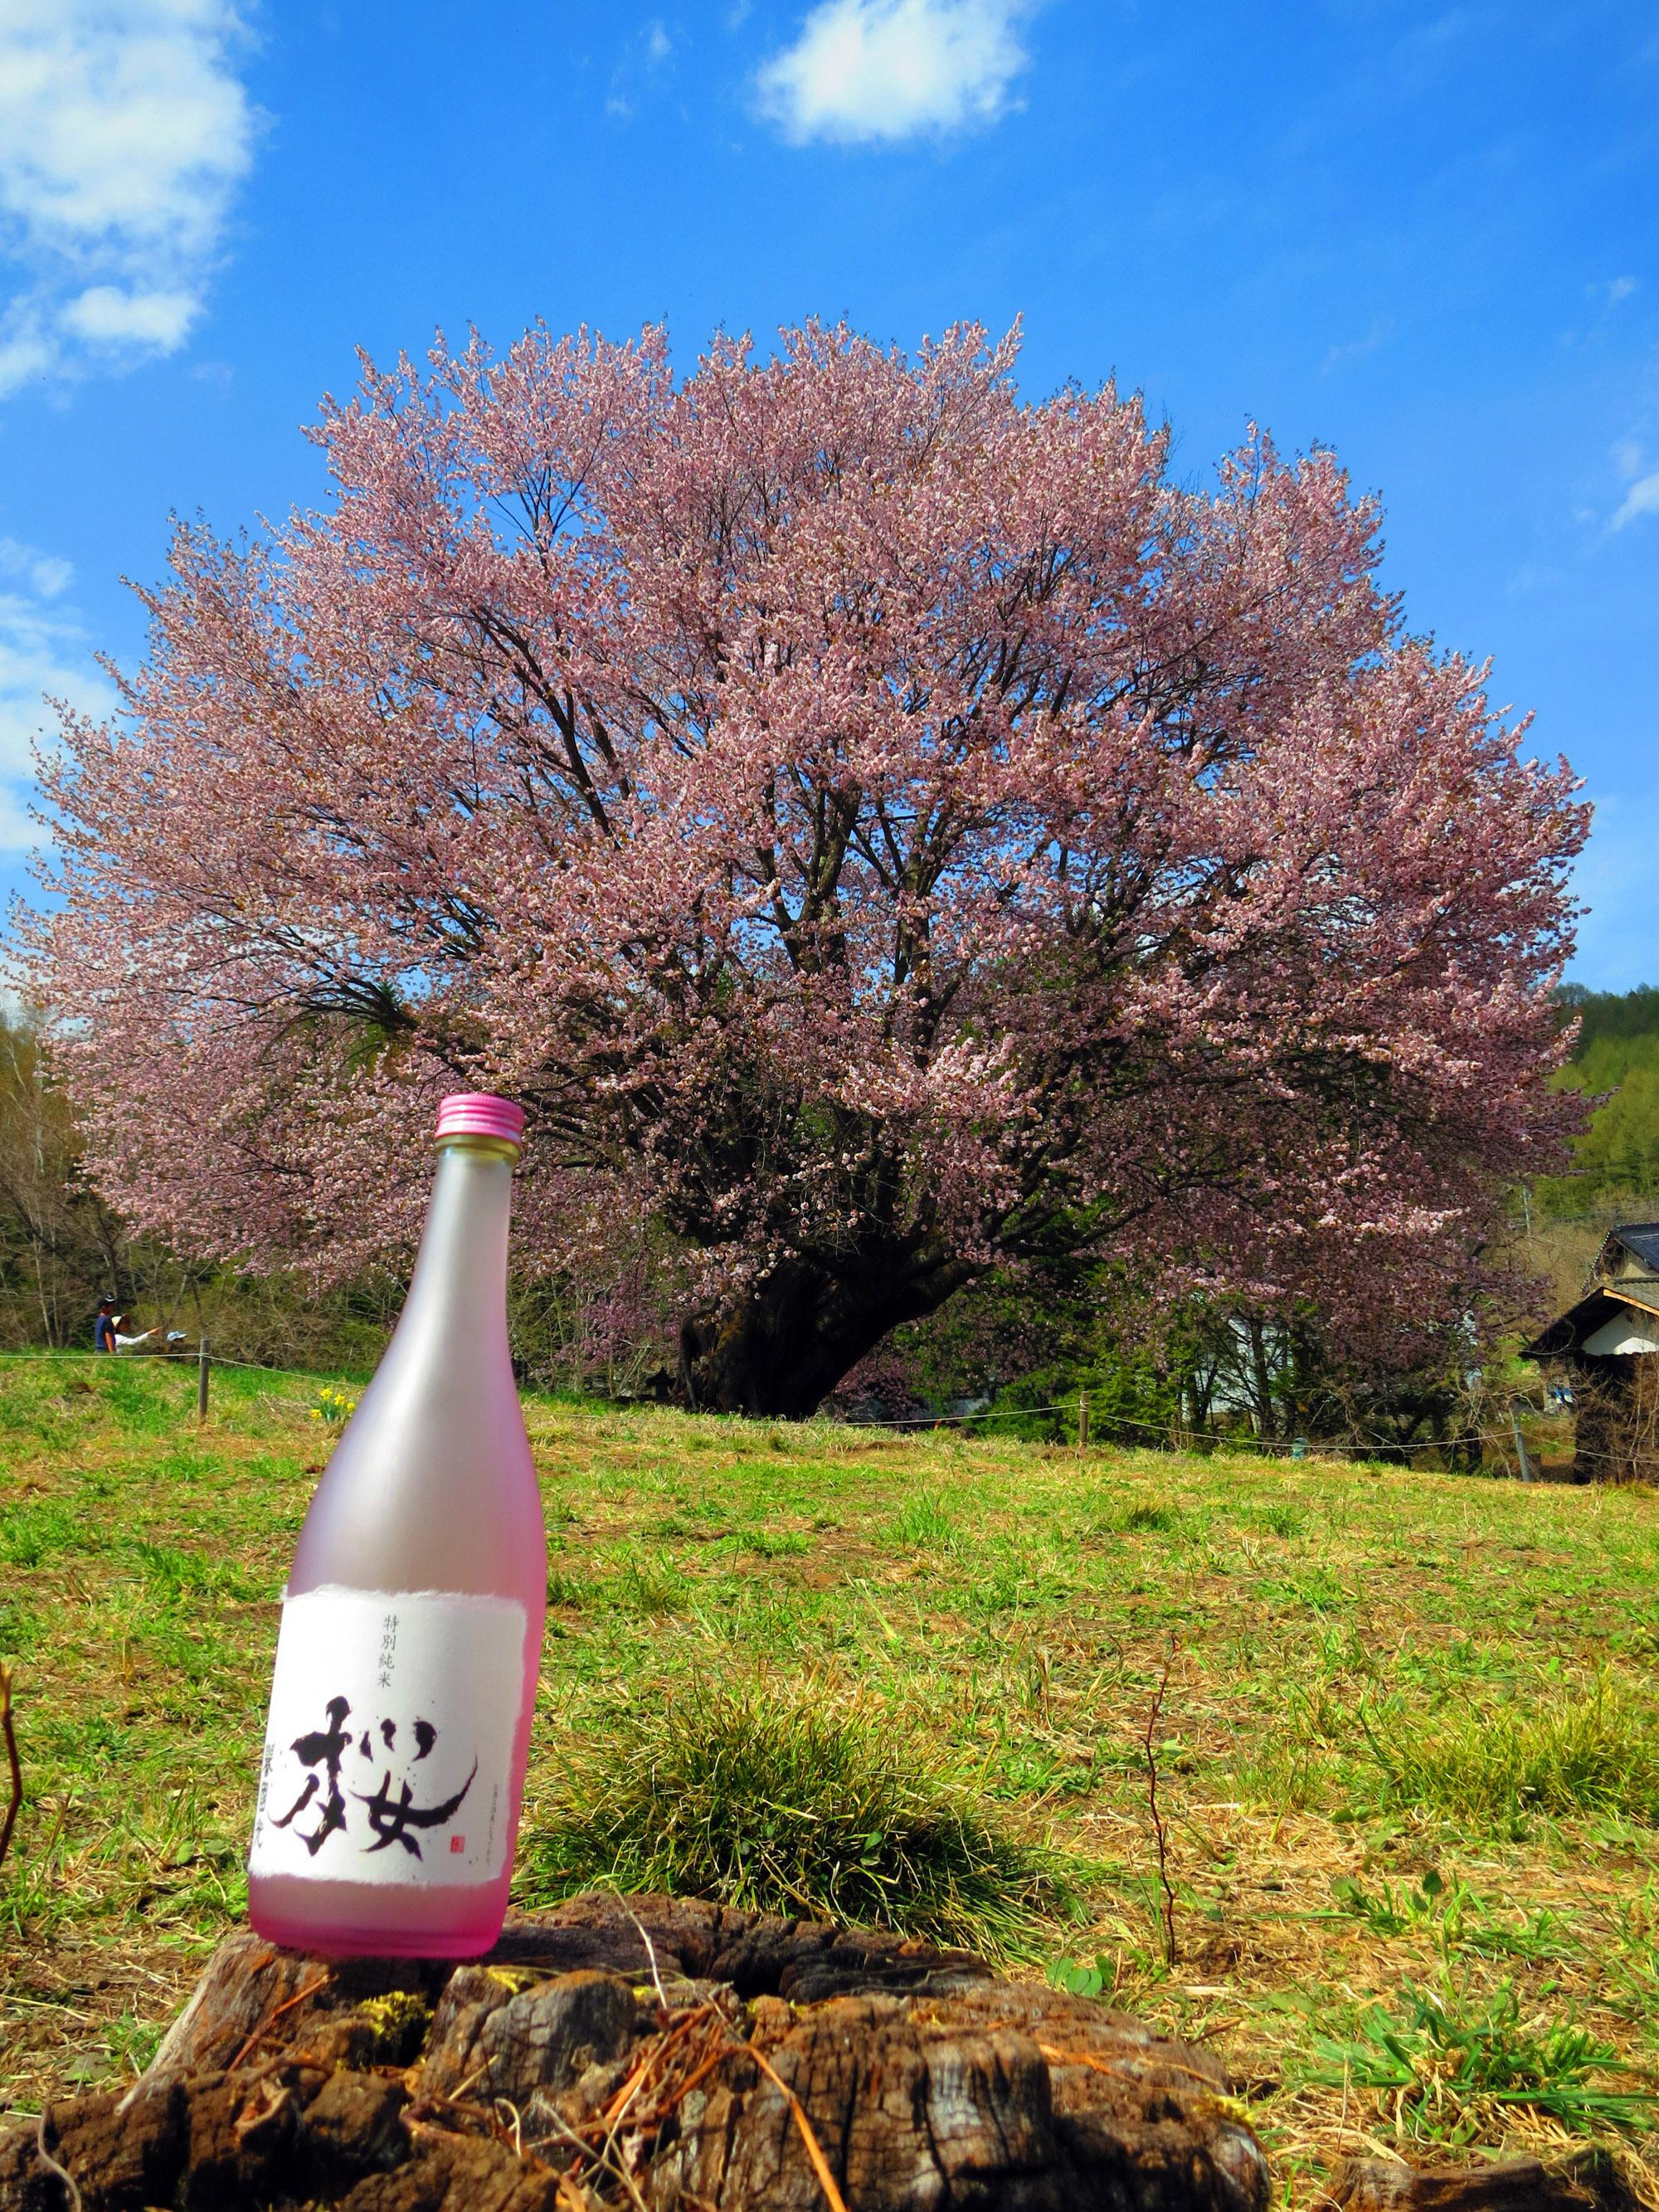 20140503 片品村の「天王桜」と譽國光季節限定酒の「桜」 撮影 遠藤夕幻